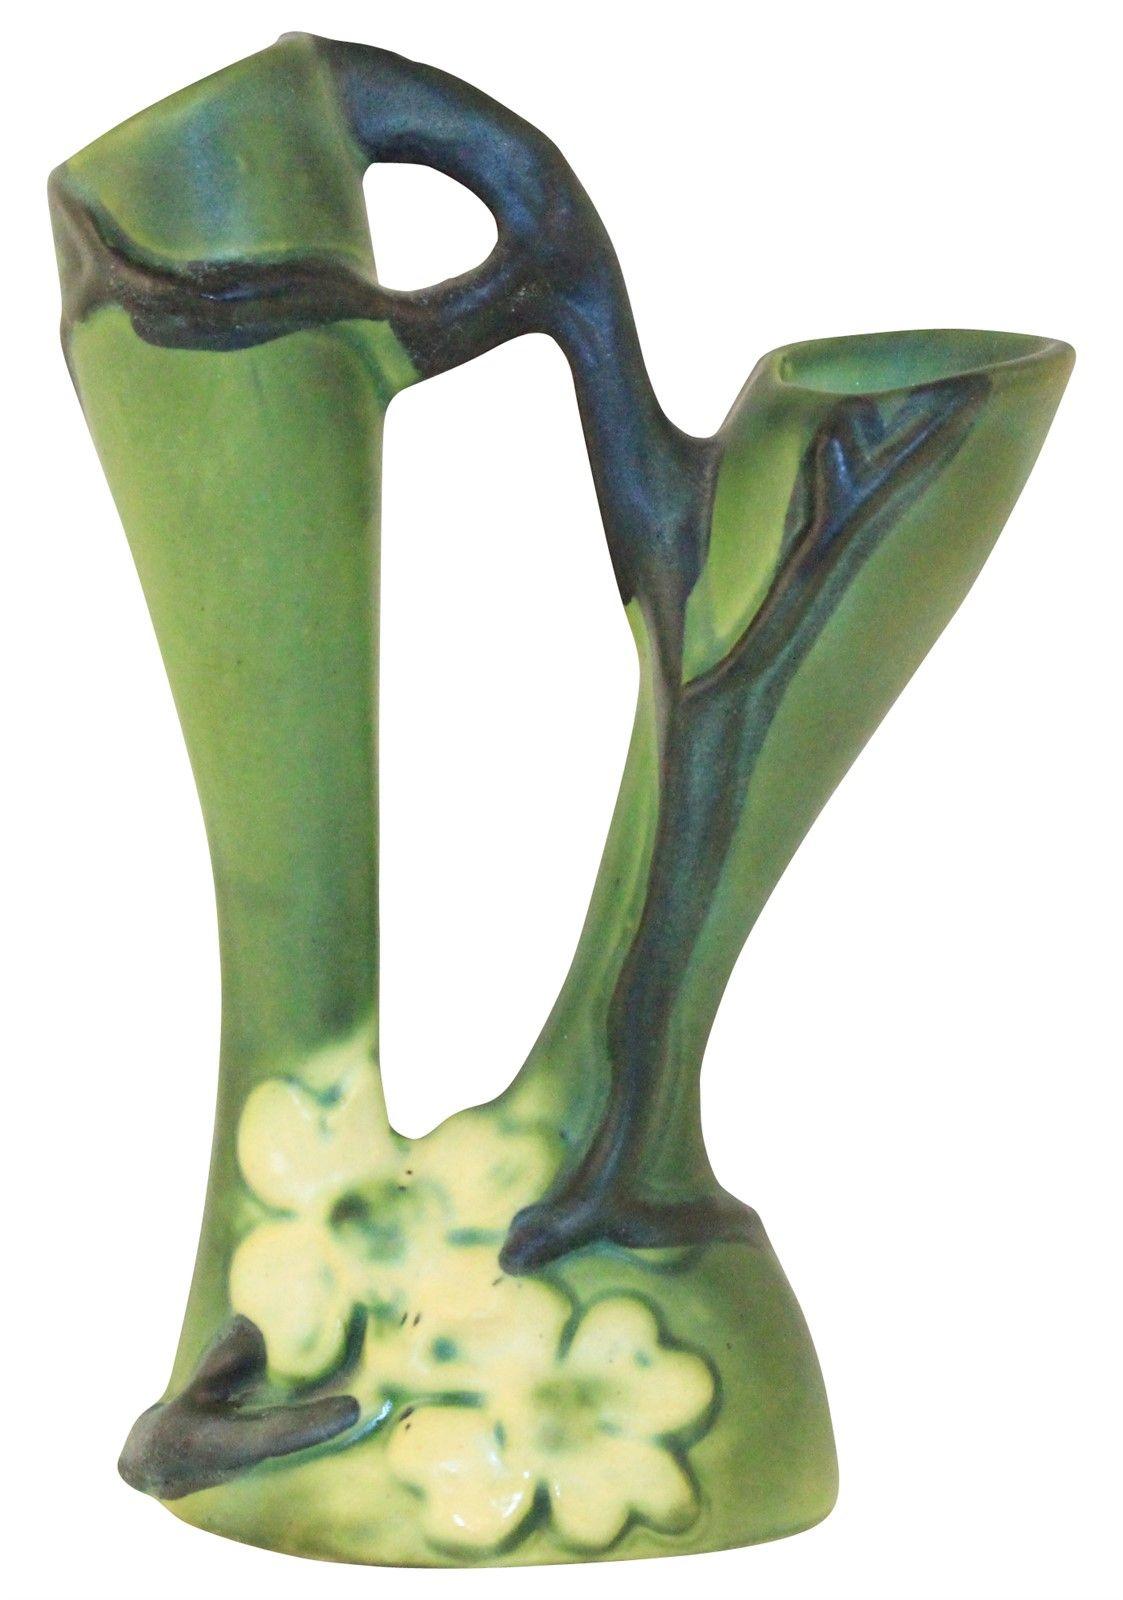 Roseville Pottery Dogwood Smooth Double Bud Vase Pottery Art